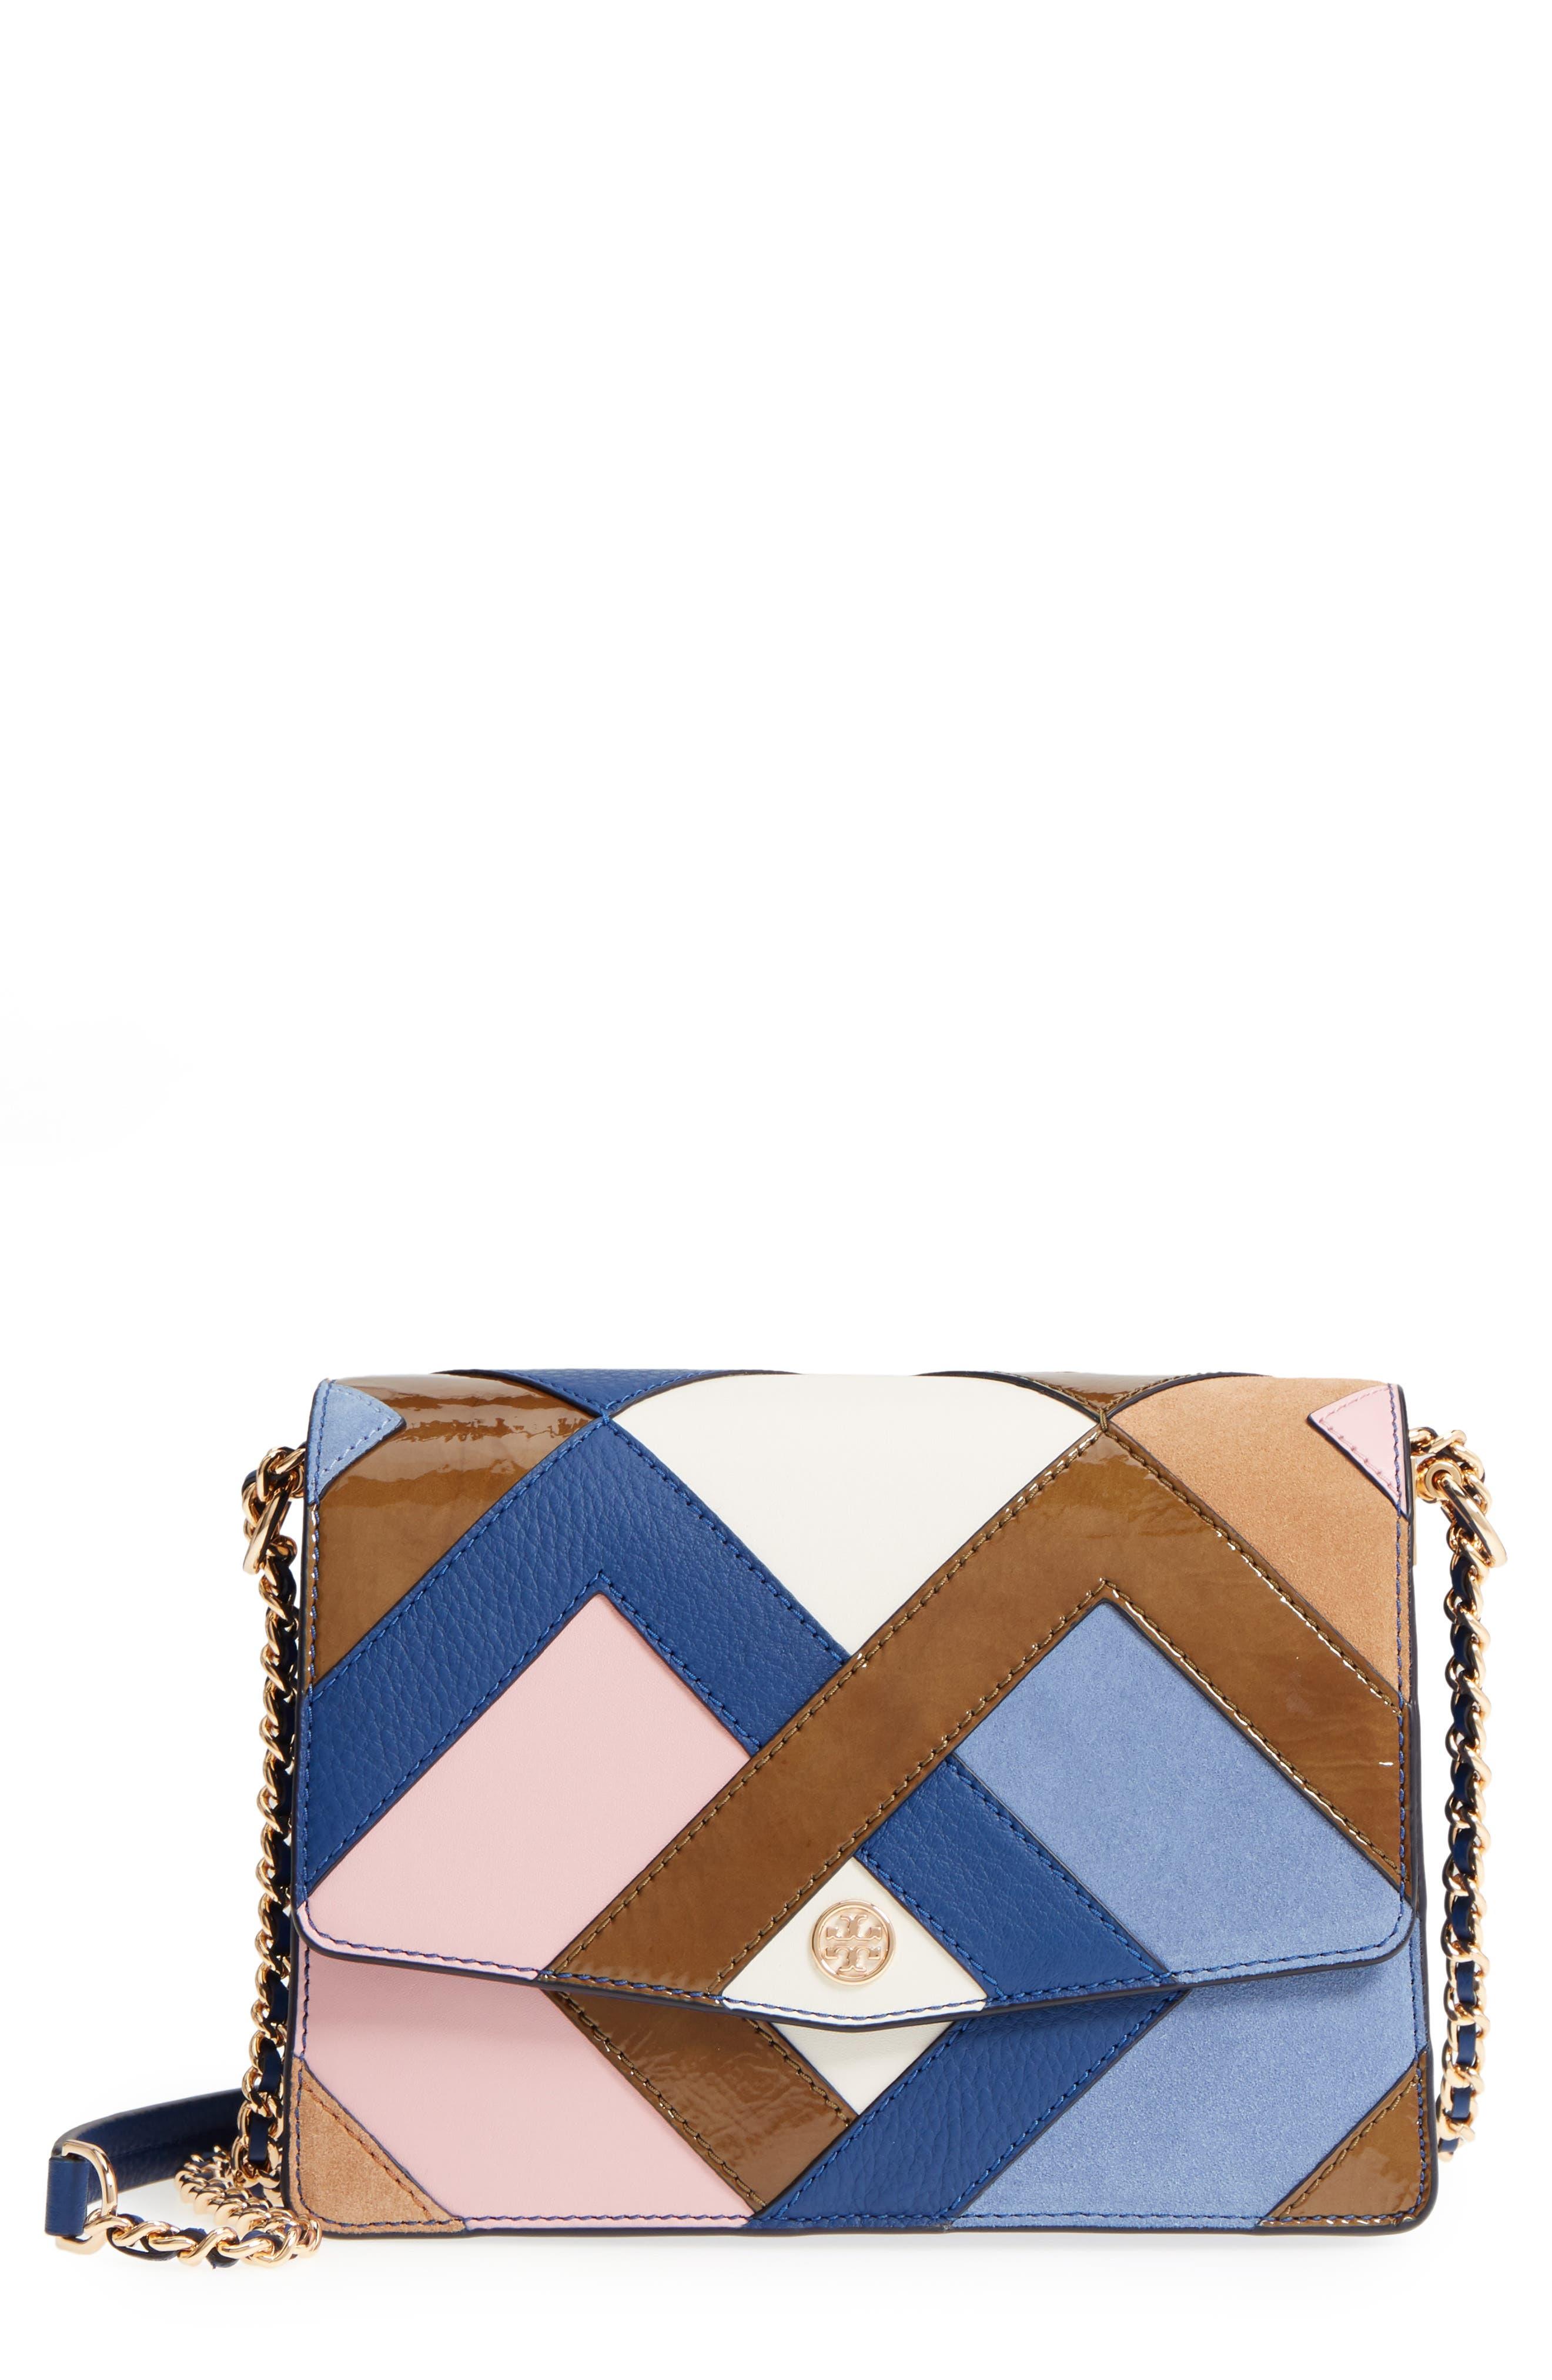 Robinson Pieced Shoulder Bag,                             Main thumbnail 1, color,                             NAVY MULTI